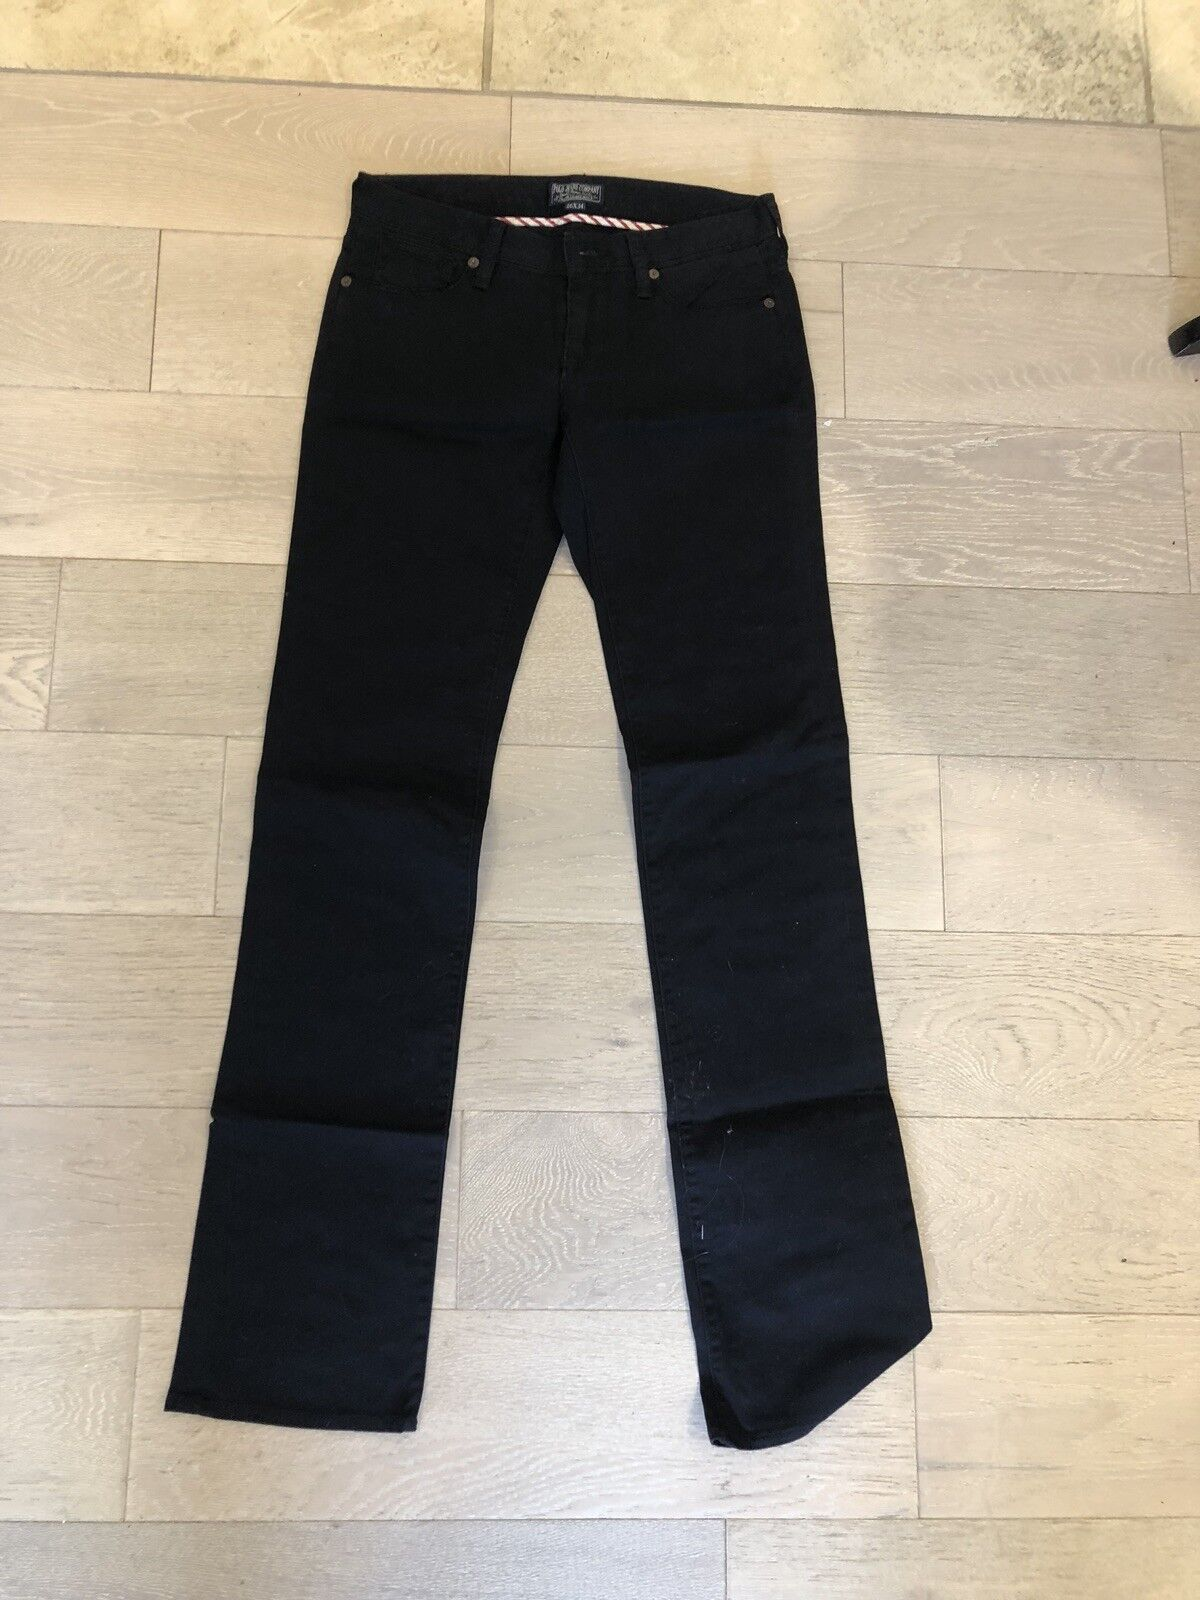 Genuine Polo Jeans  Ralp Lauren Trousers 26 34